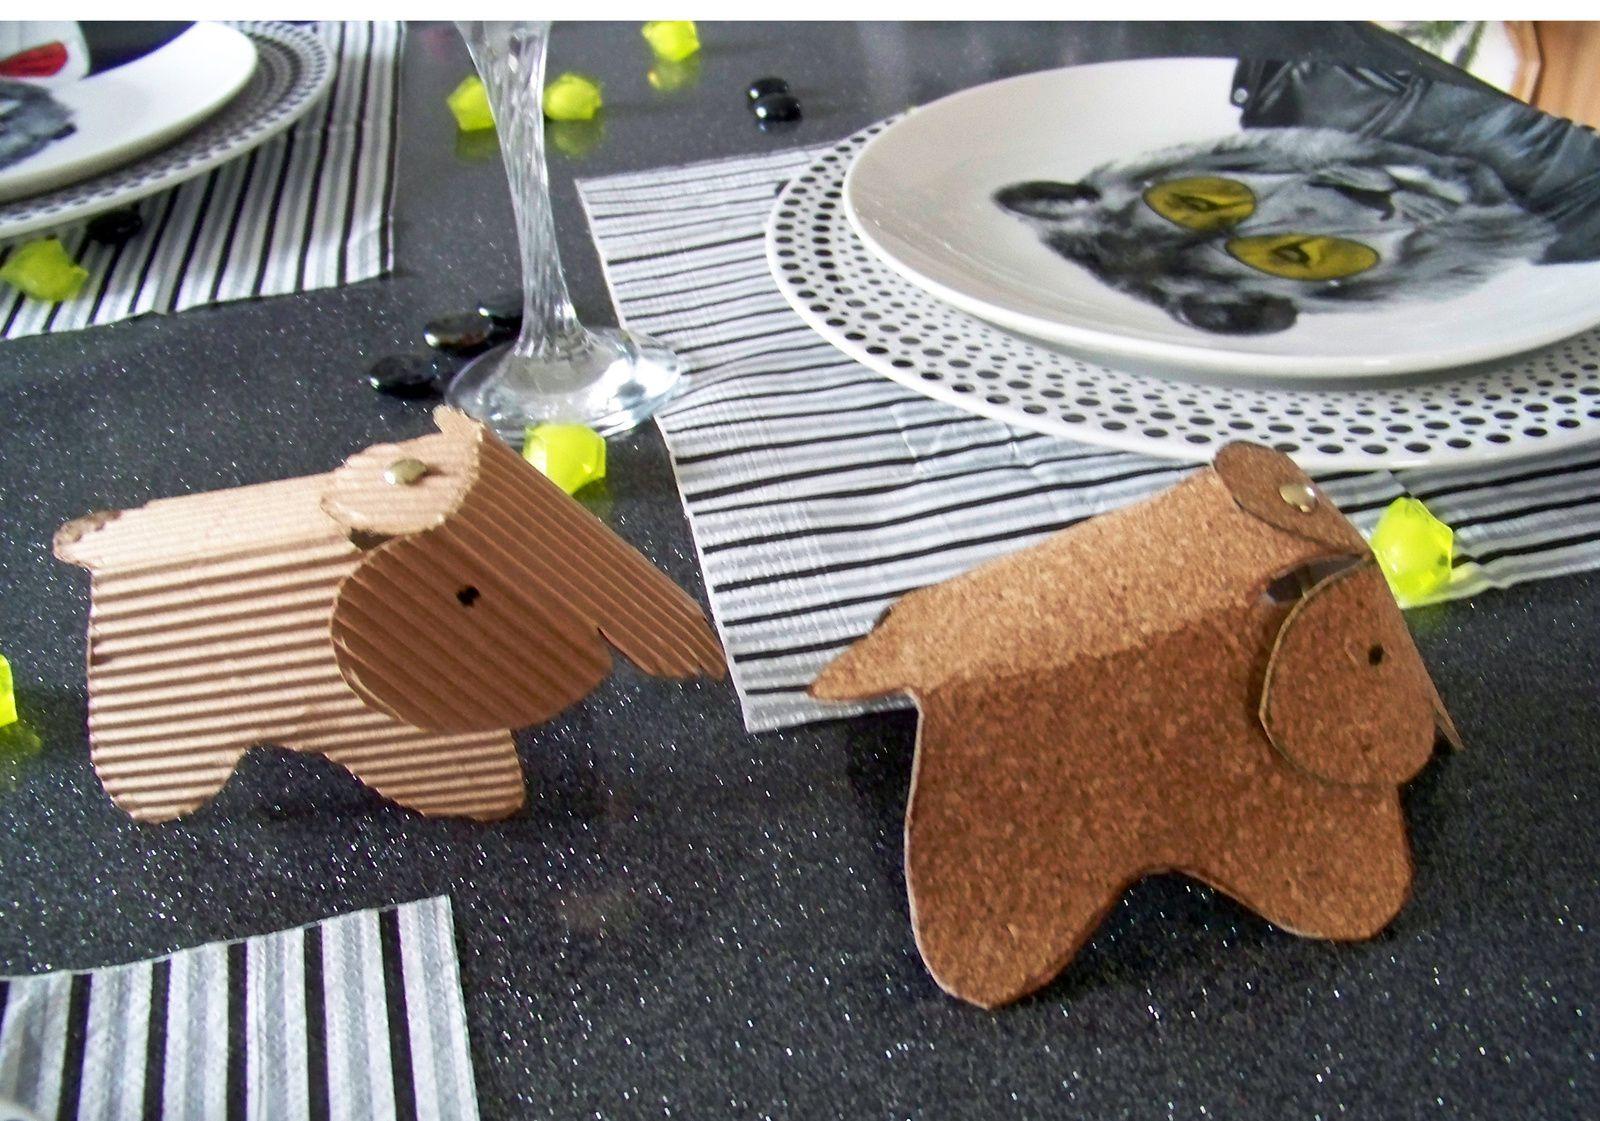 DIY L'éléphant Eames vitra version  liège ou carton ondulé